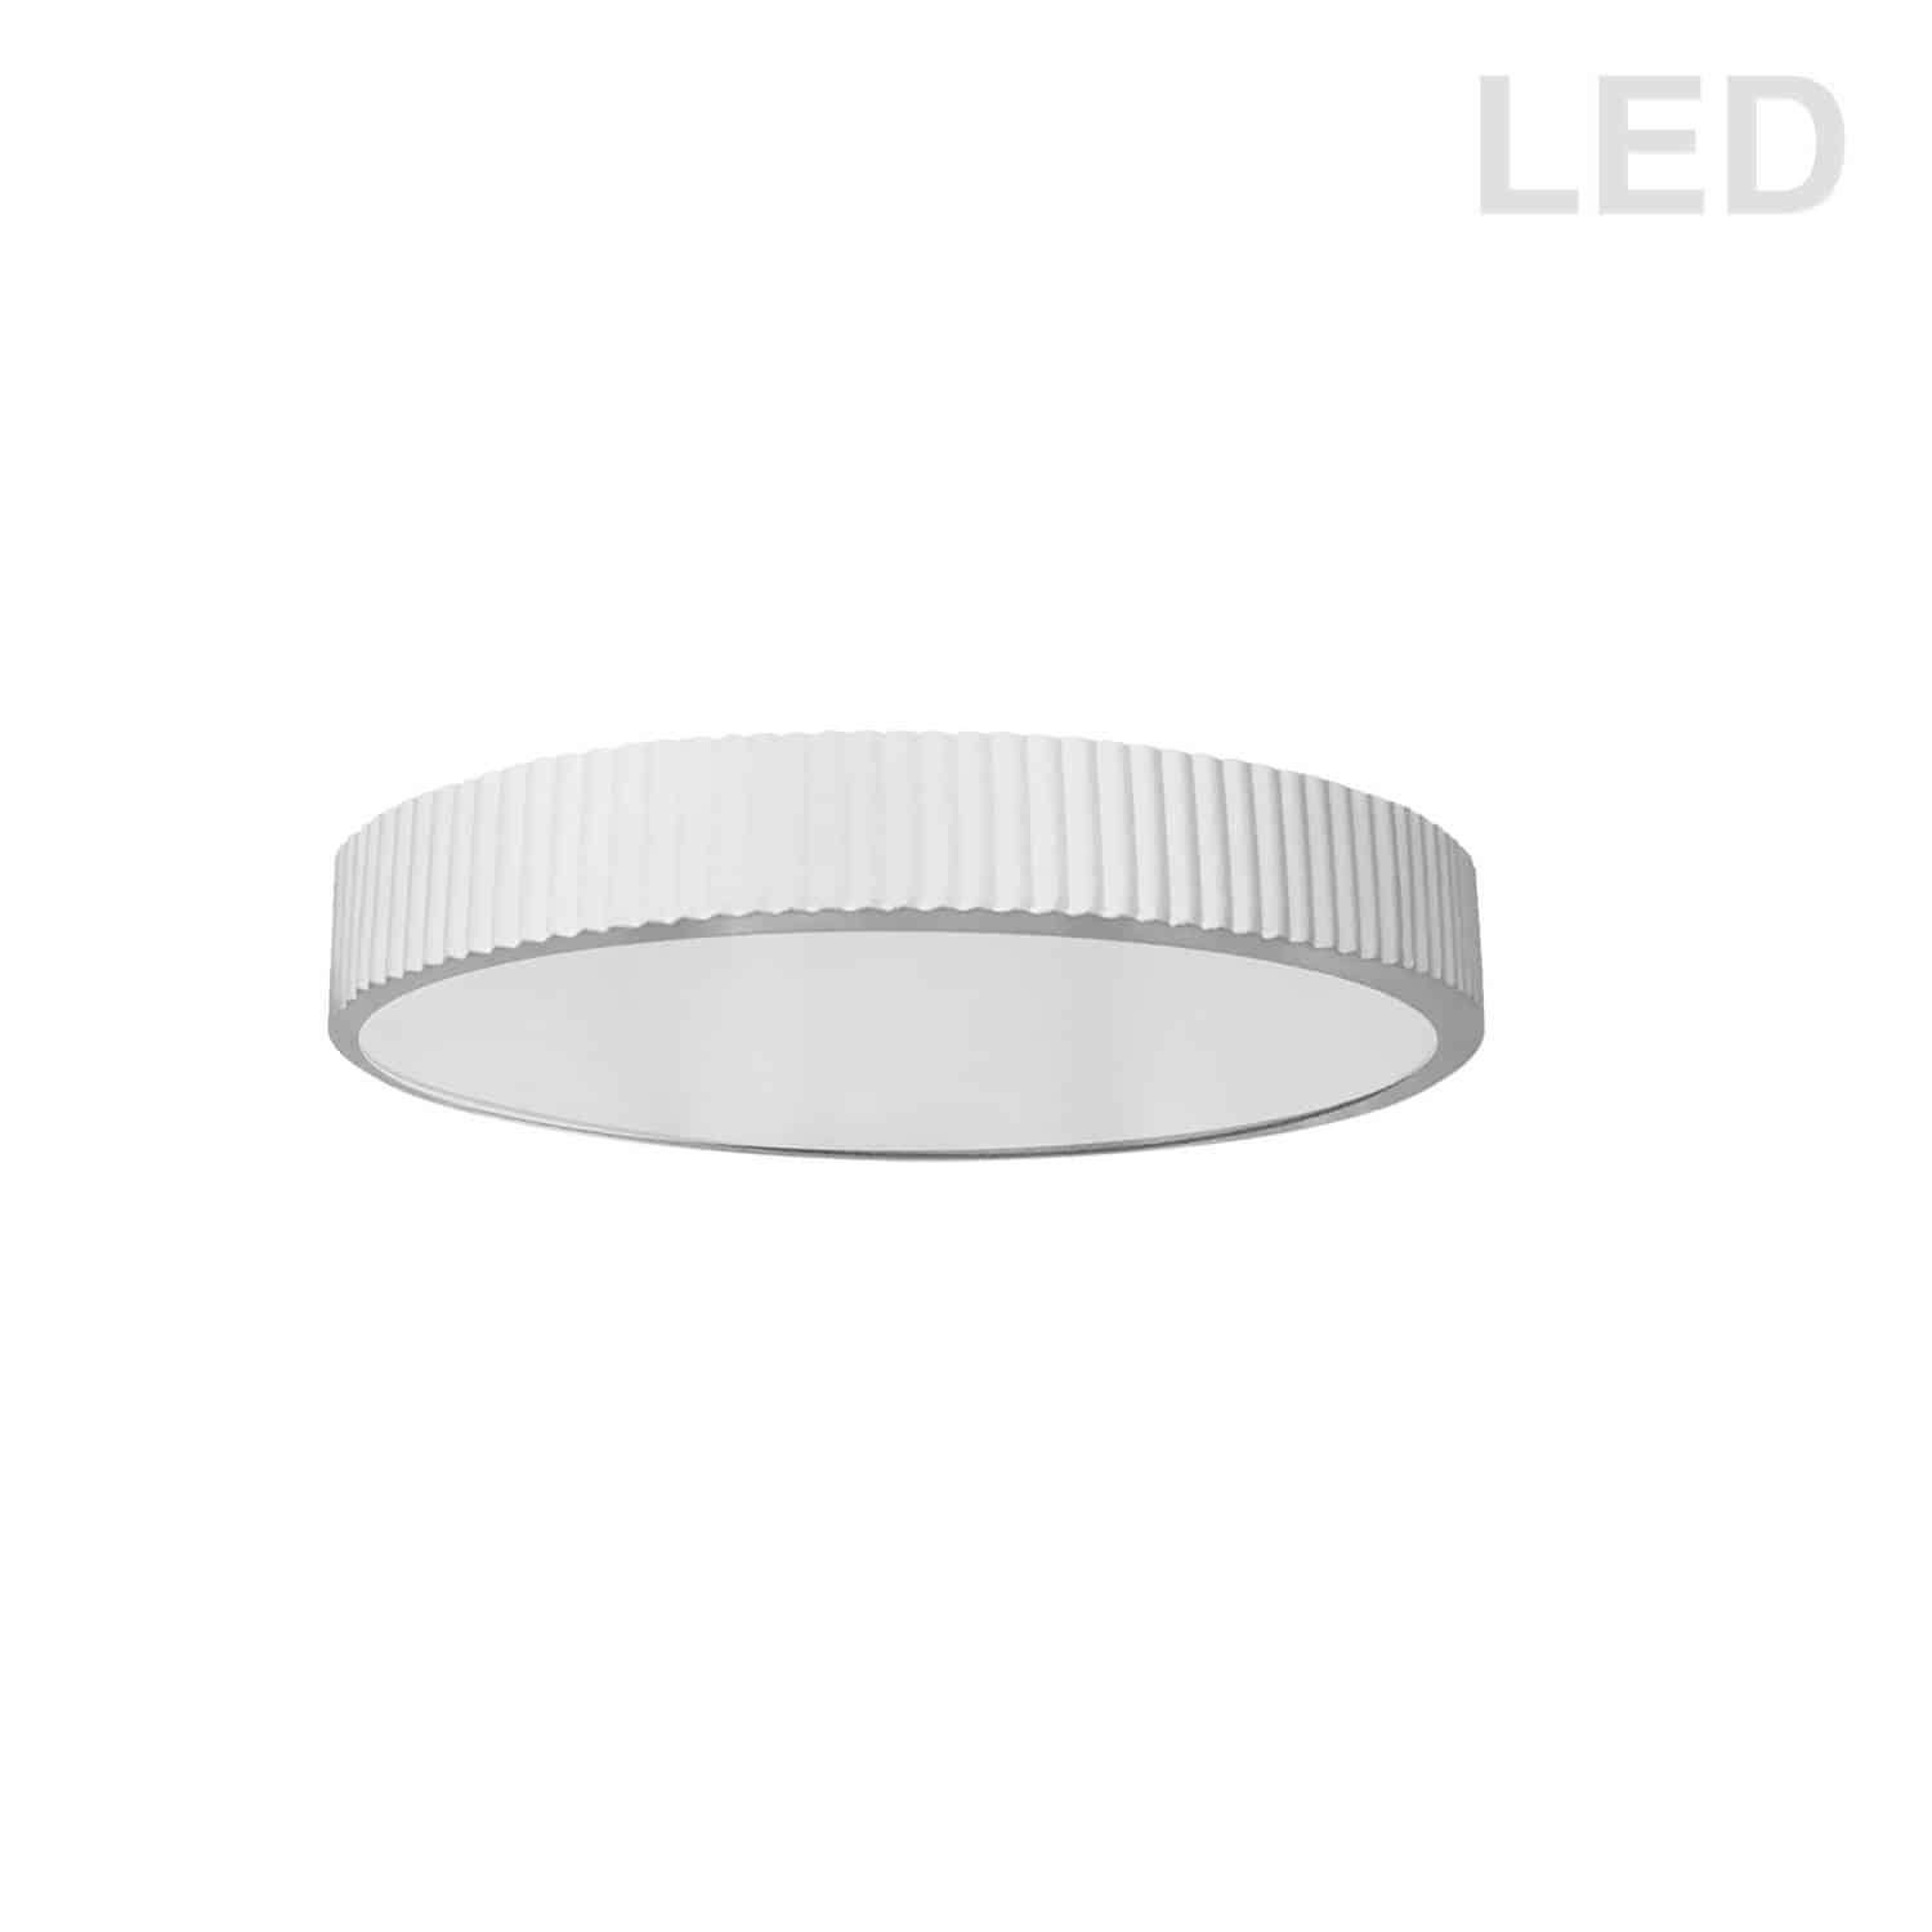 30W LED Flush mount, Matte White with White Acrylic Diffuser